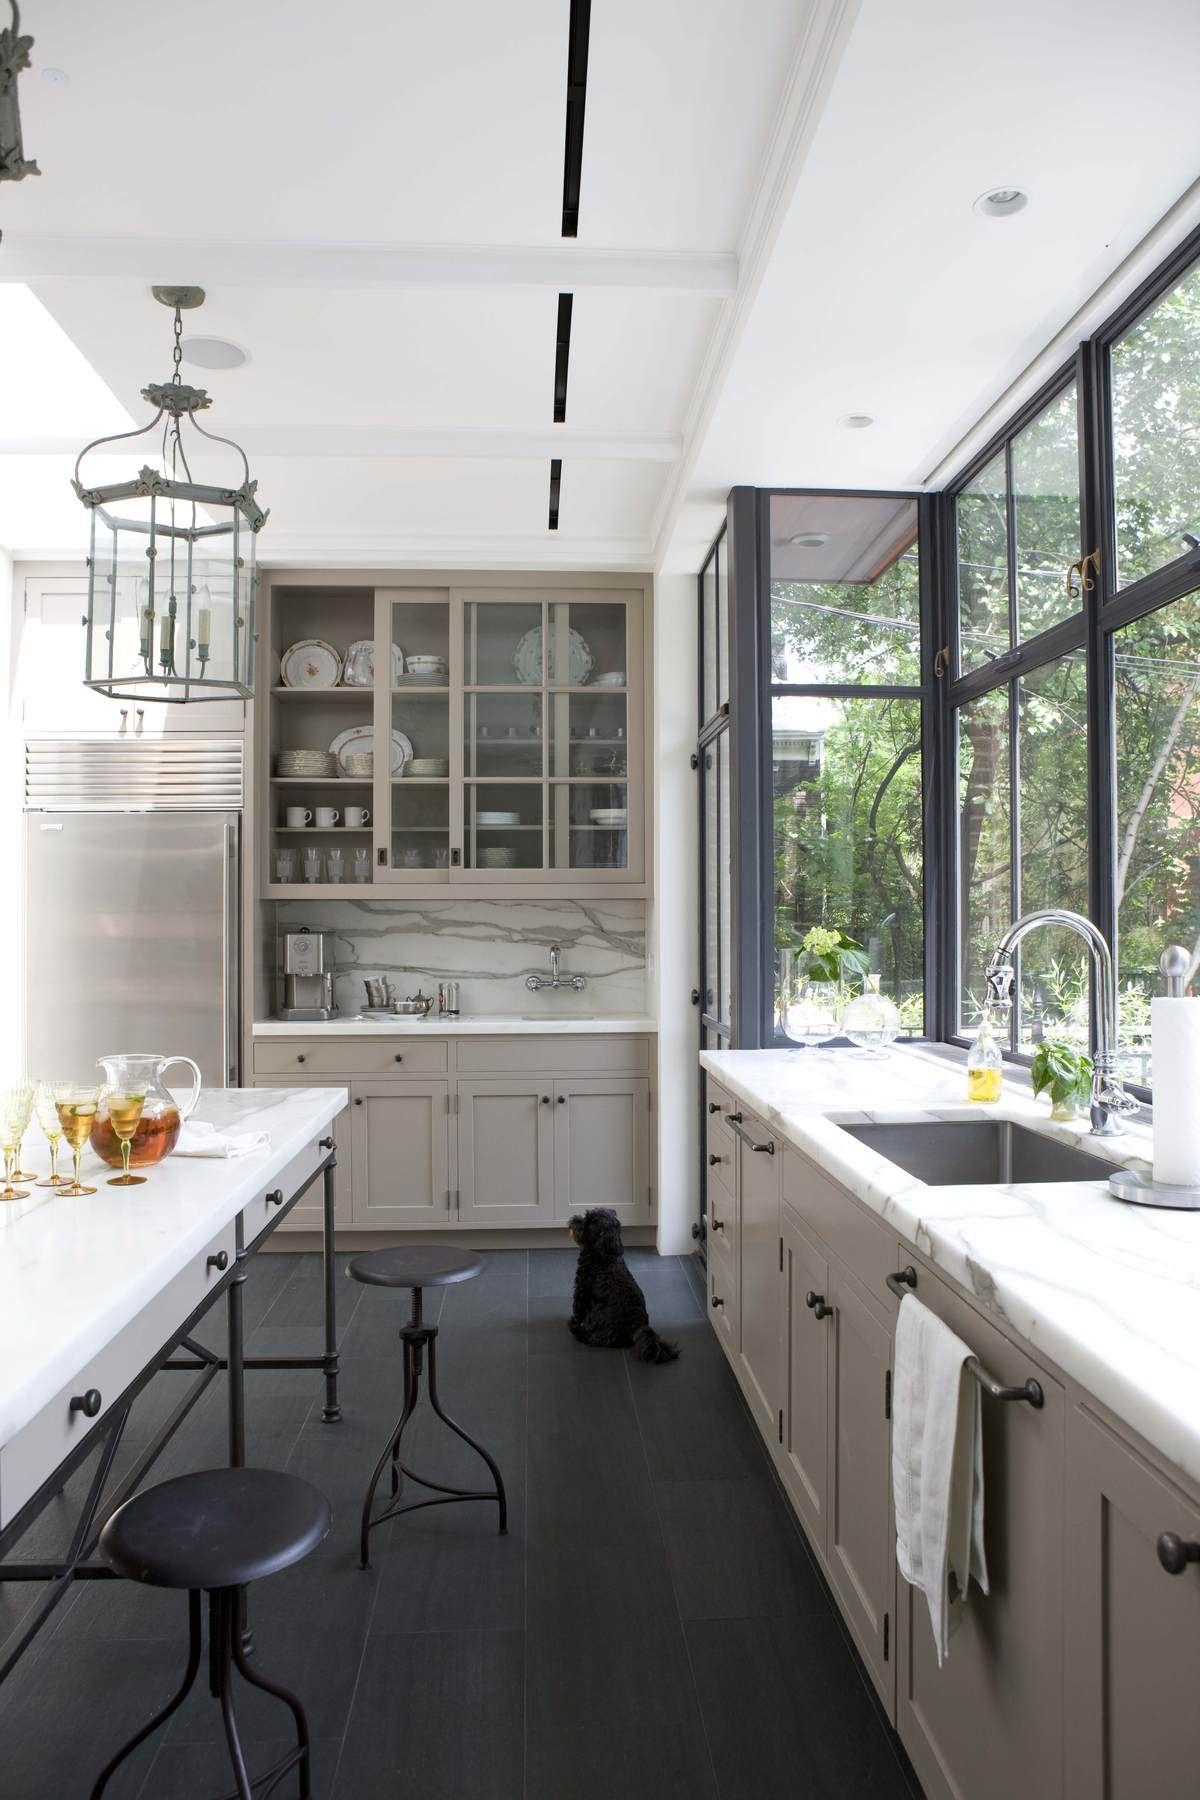 Brooklyn rowhouse robinson grisaru architecture pc photo melanie acevedo archinect also black kitchen cabinets design ideas pinterest rh